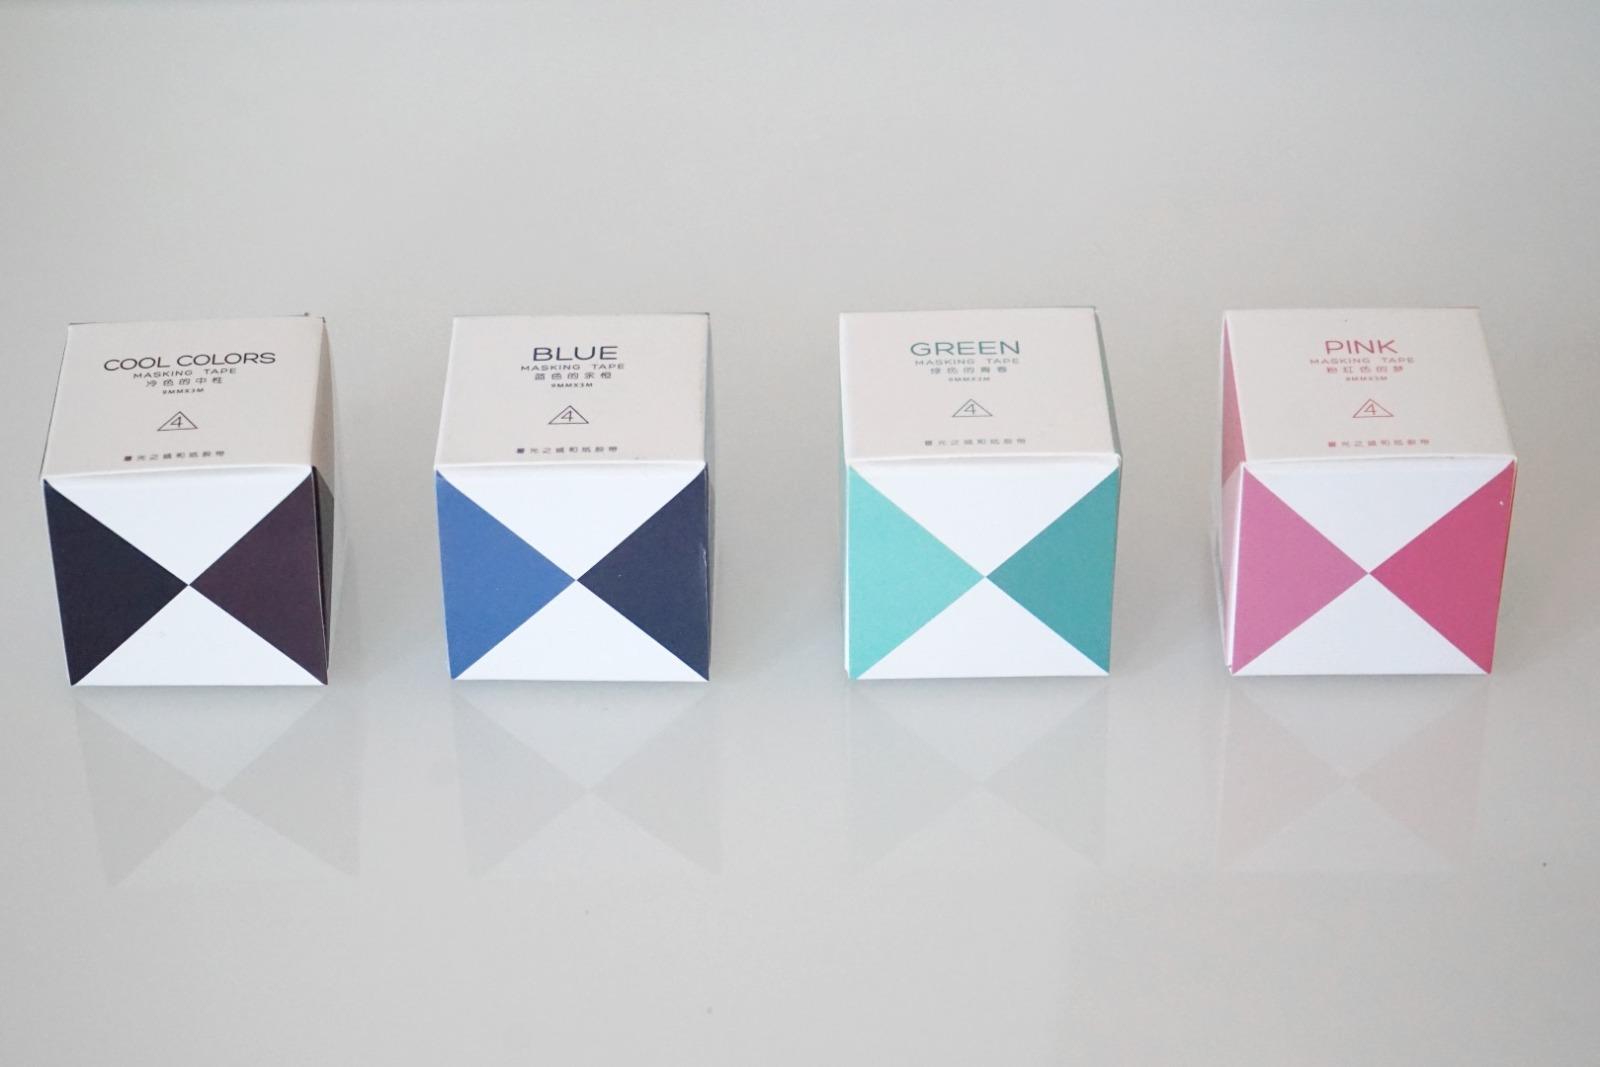 Klebeband Washi Tape Cool Colors - 2